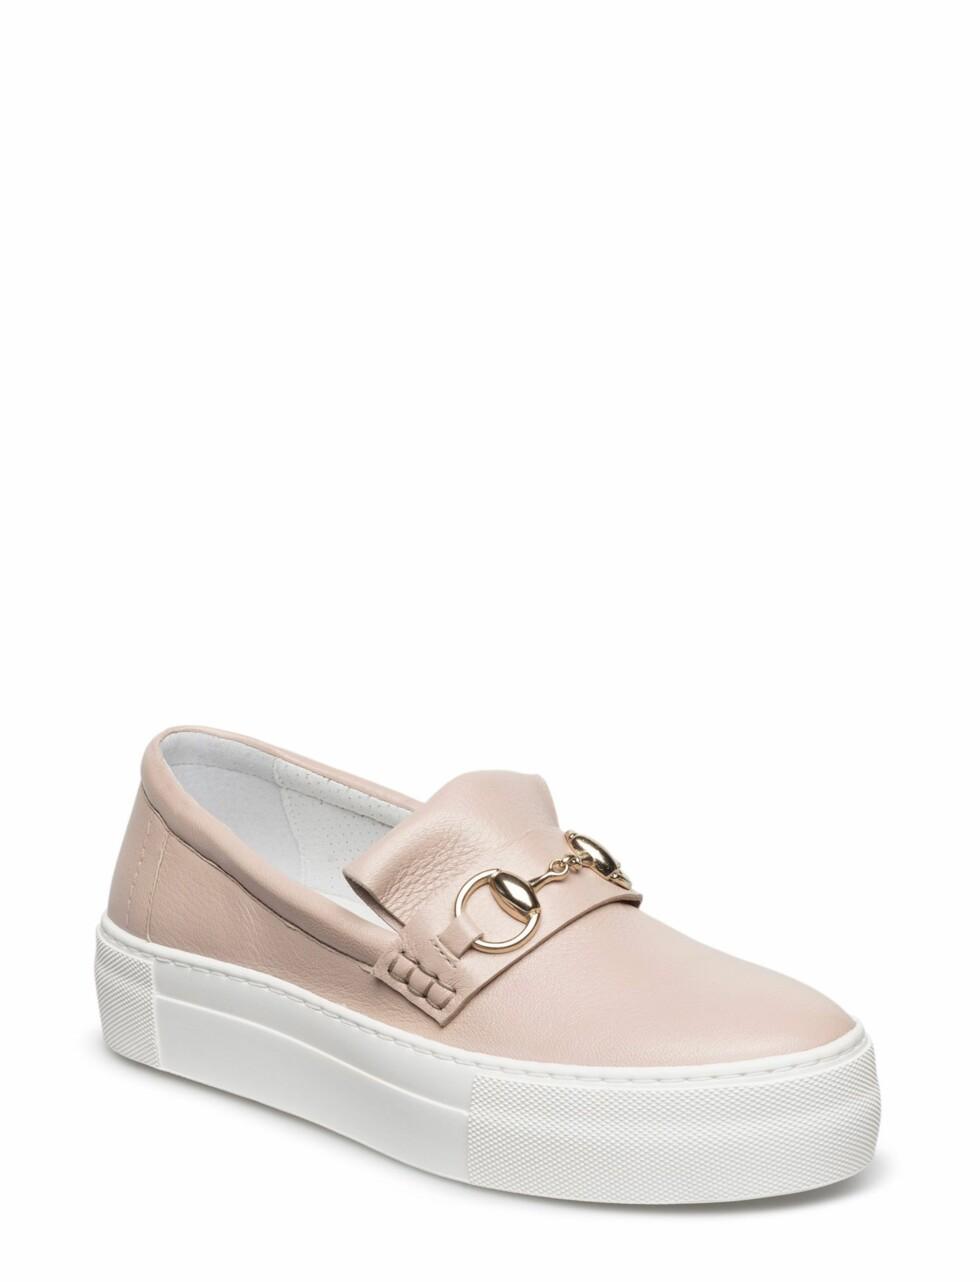 Dus rosa sko fra Billi Bi |kr 1399 | http://apprl.com/sv/pd/4MNU/